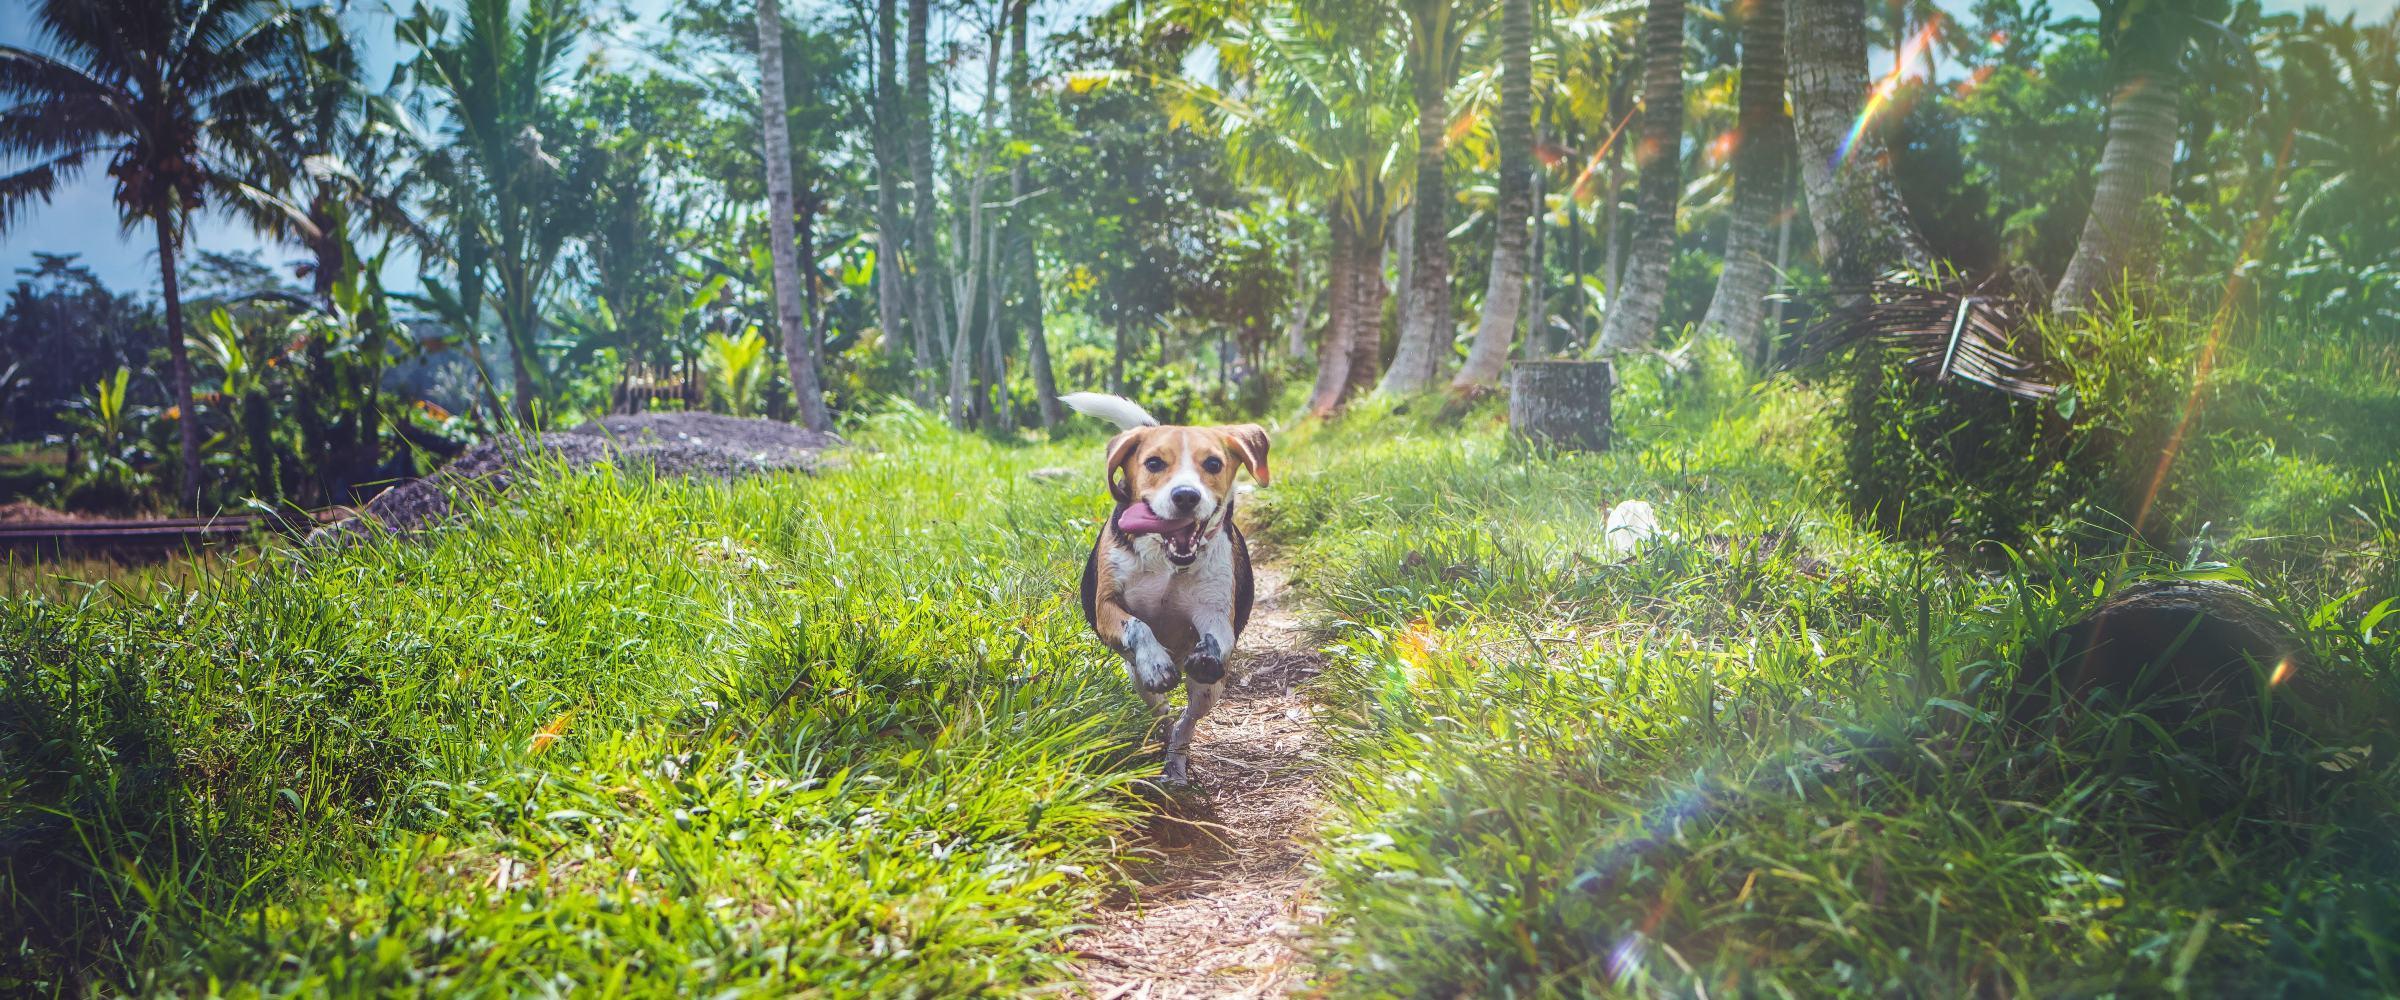 Best Orlando neighborhoods for dog owners